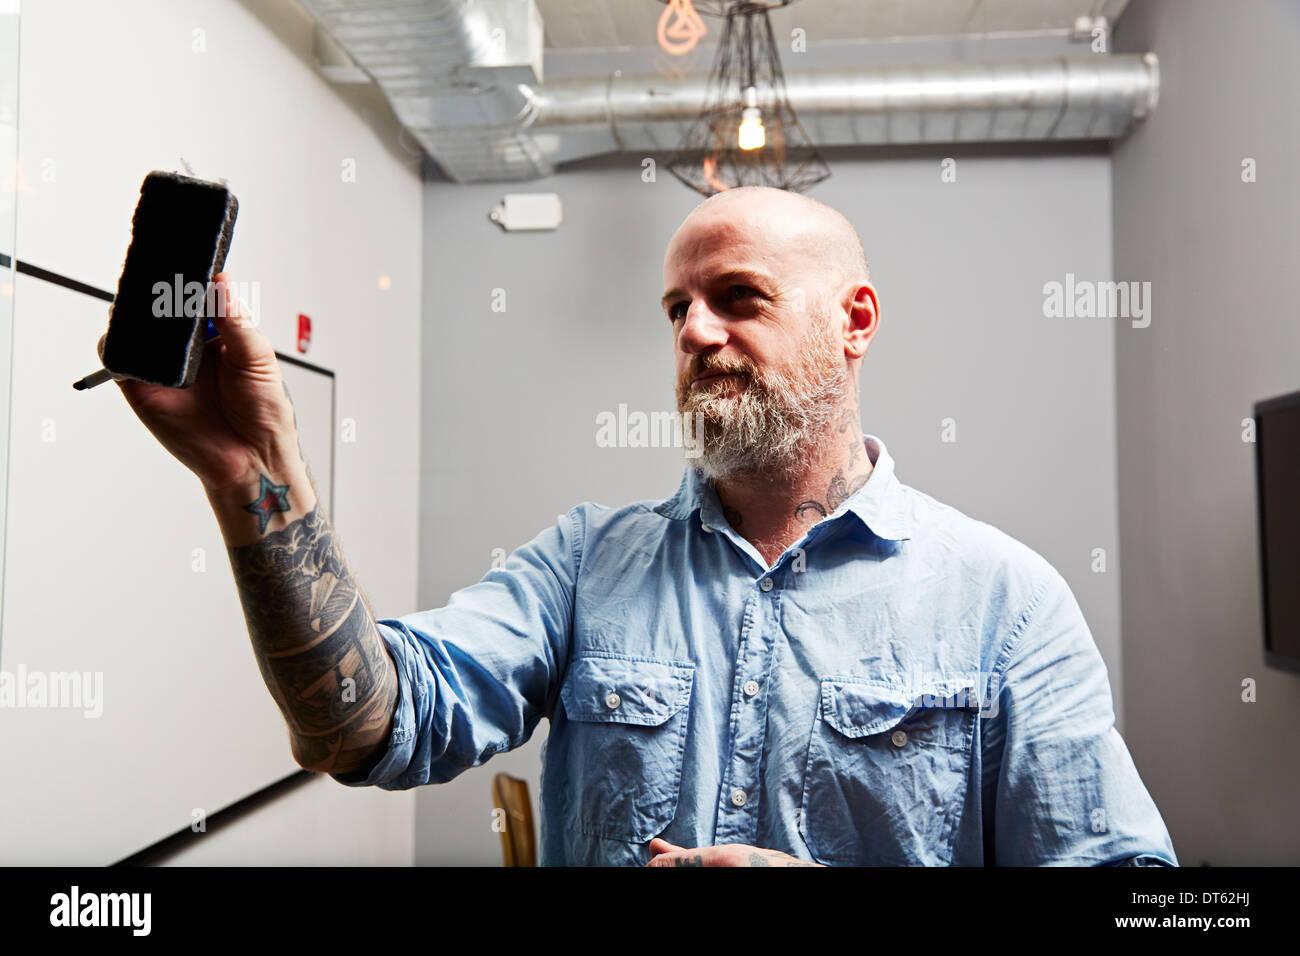 Reifer Mann mit Whiteboard-Radiergummi Stockbild